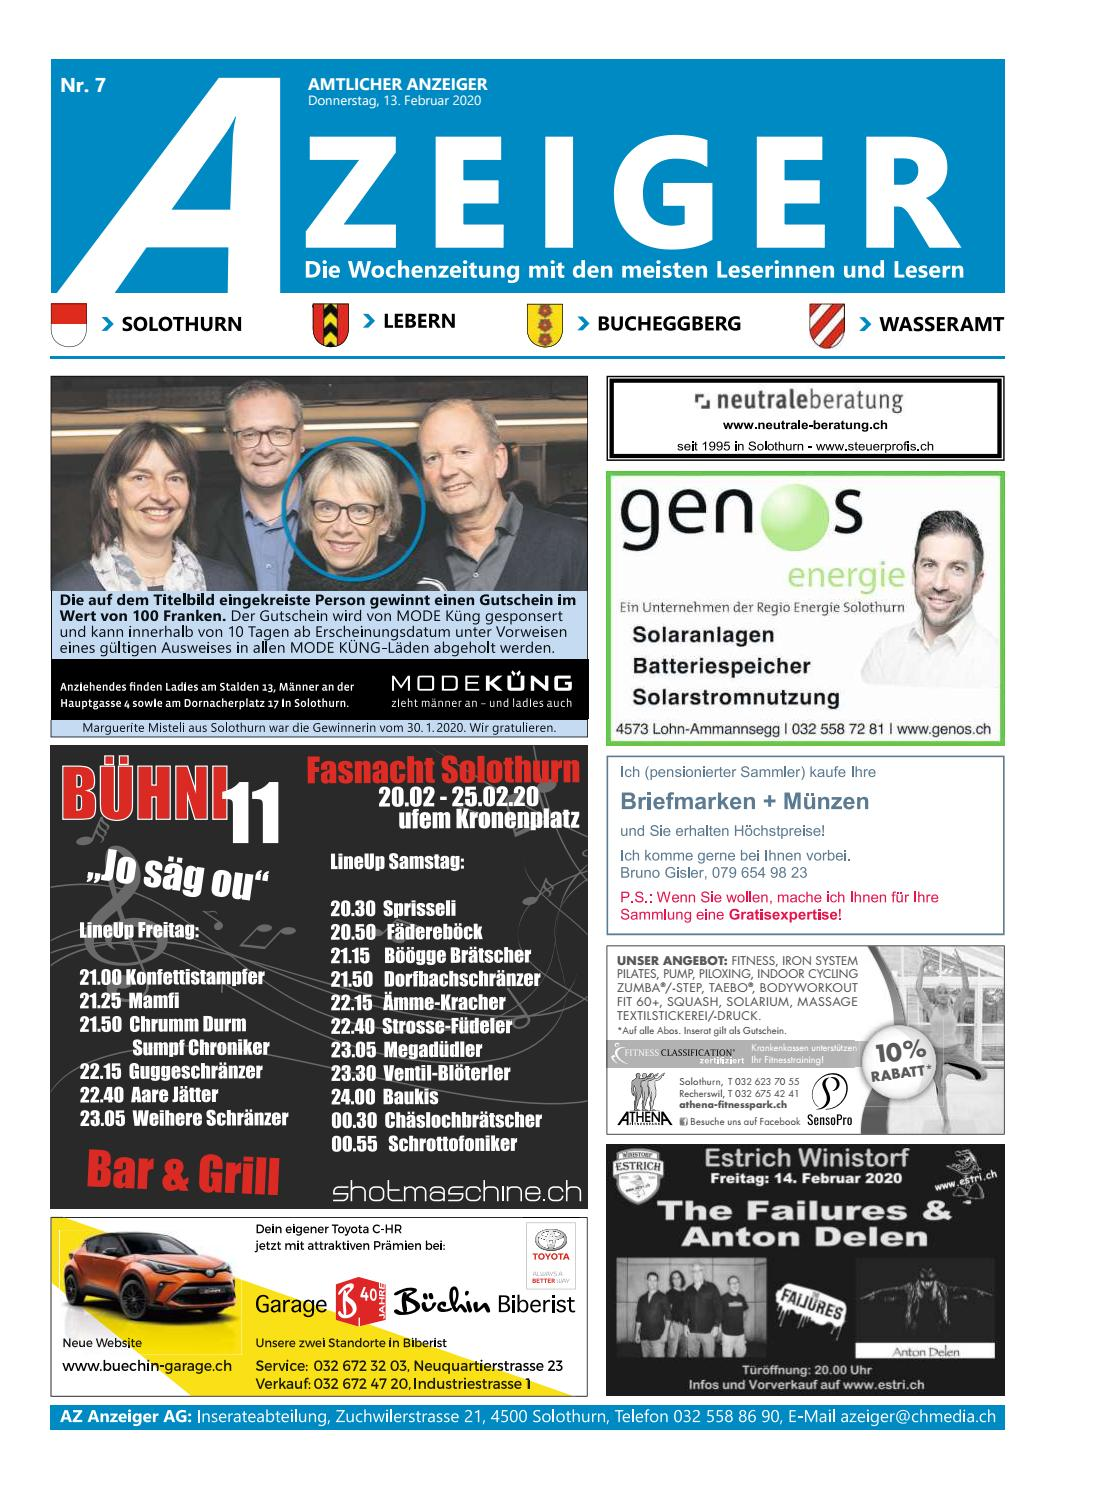 a+o_april 05 - reformierte Landeskirche Aargau